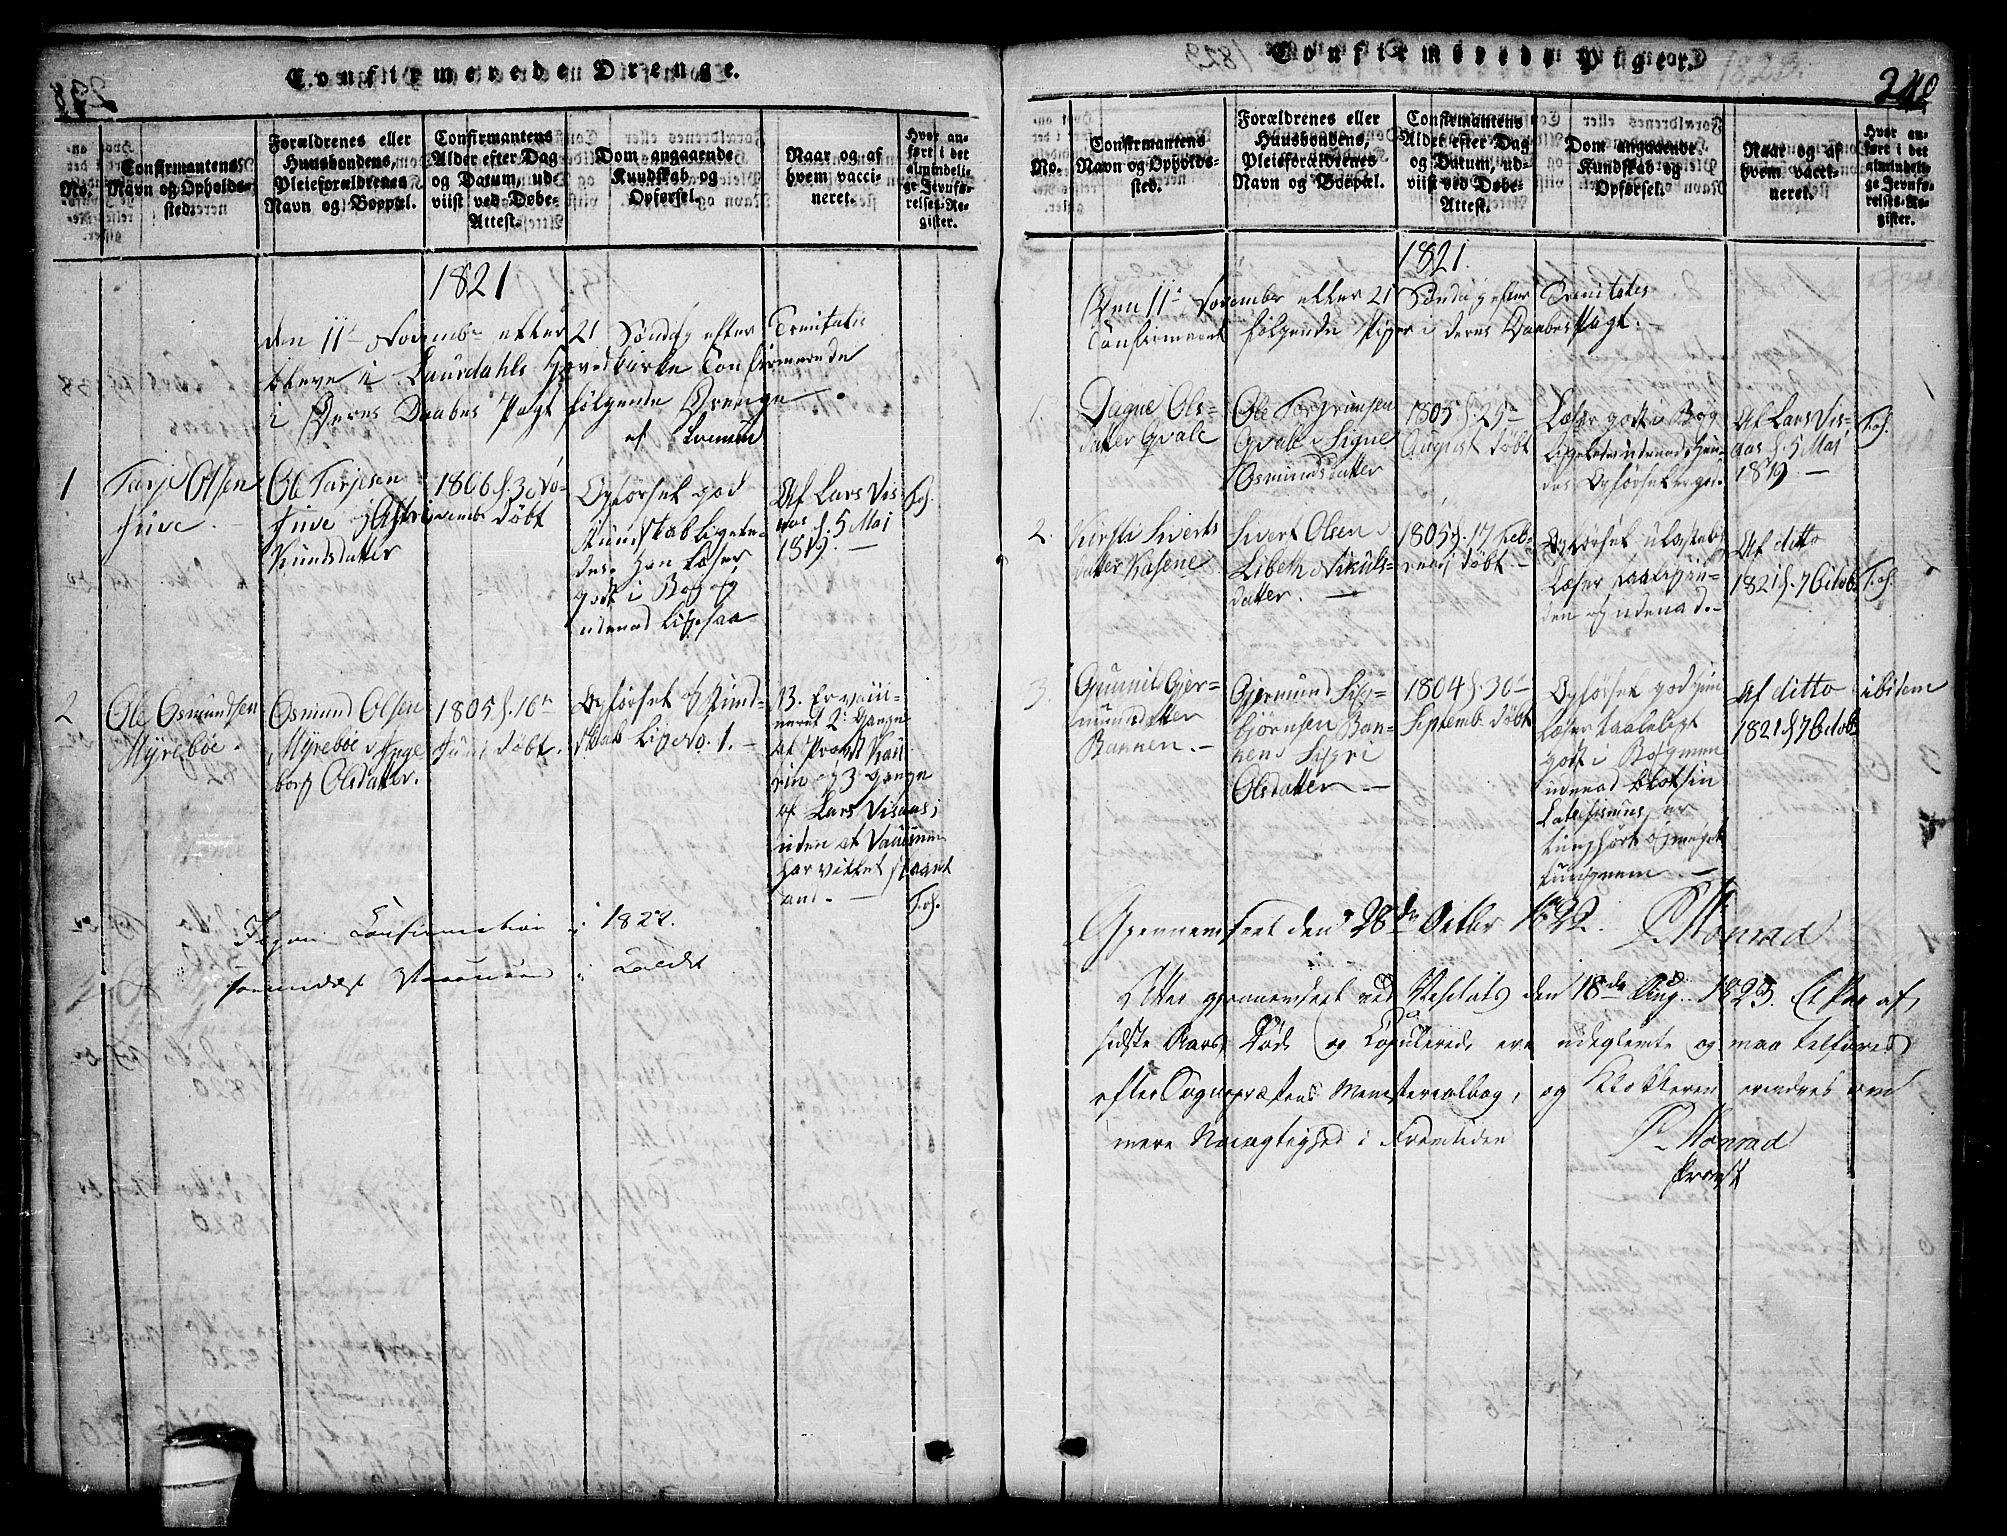 SAKO, Lårdal kirkebøker, G/Ga/L0001: Klokkerbok nr. I 1, 1815-1861, s. 240